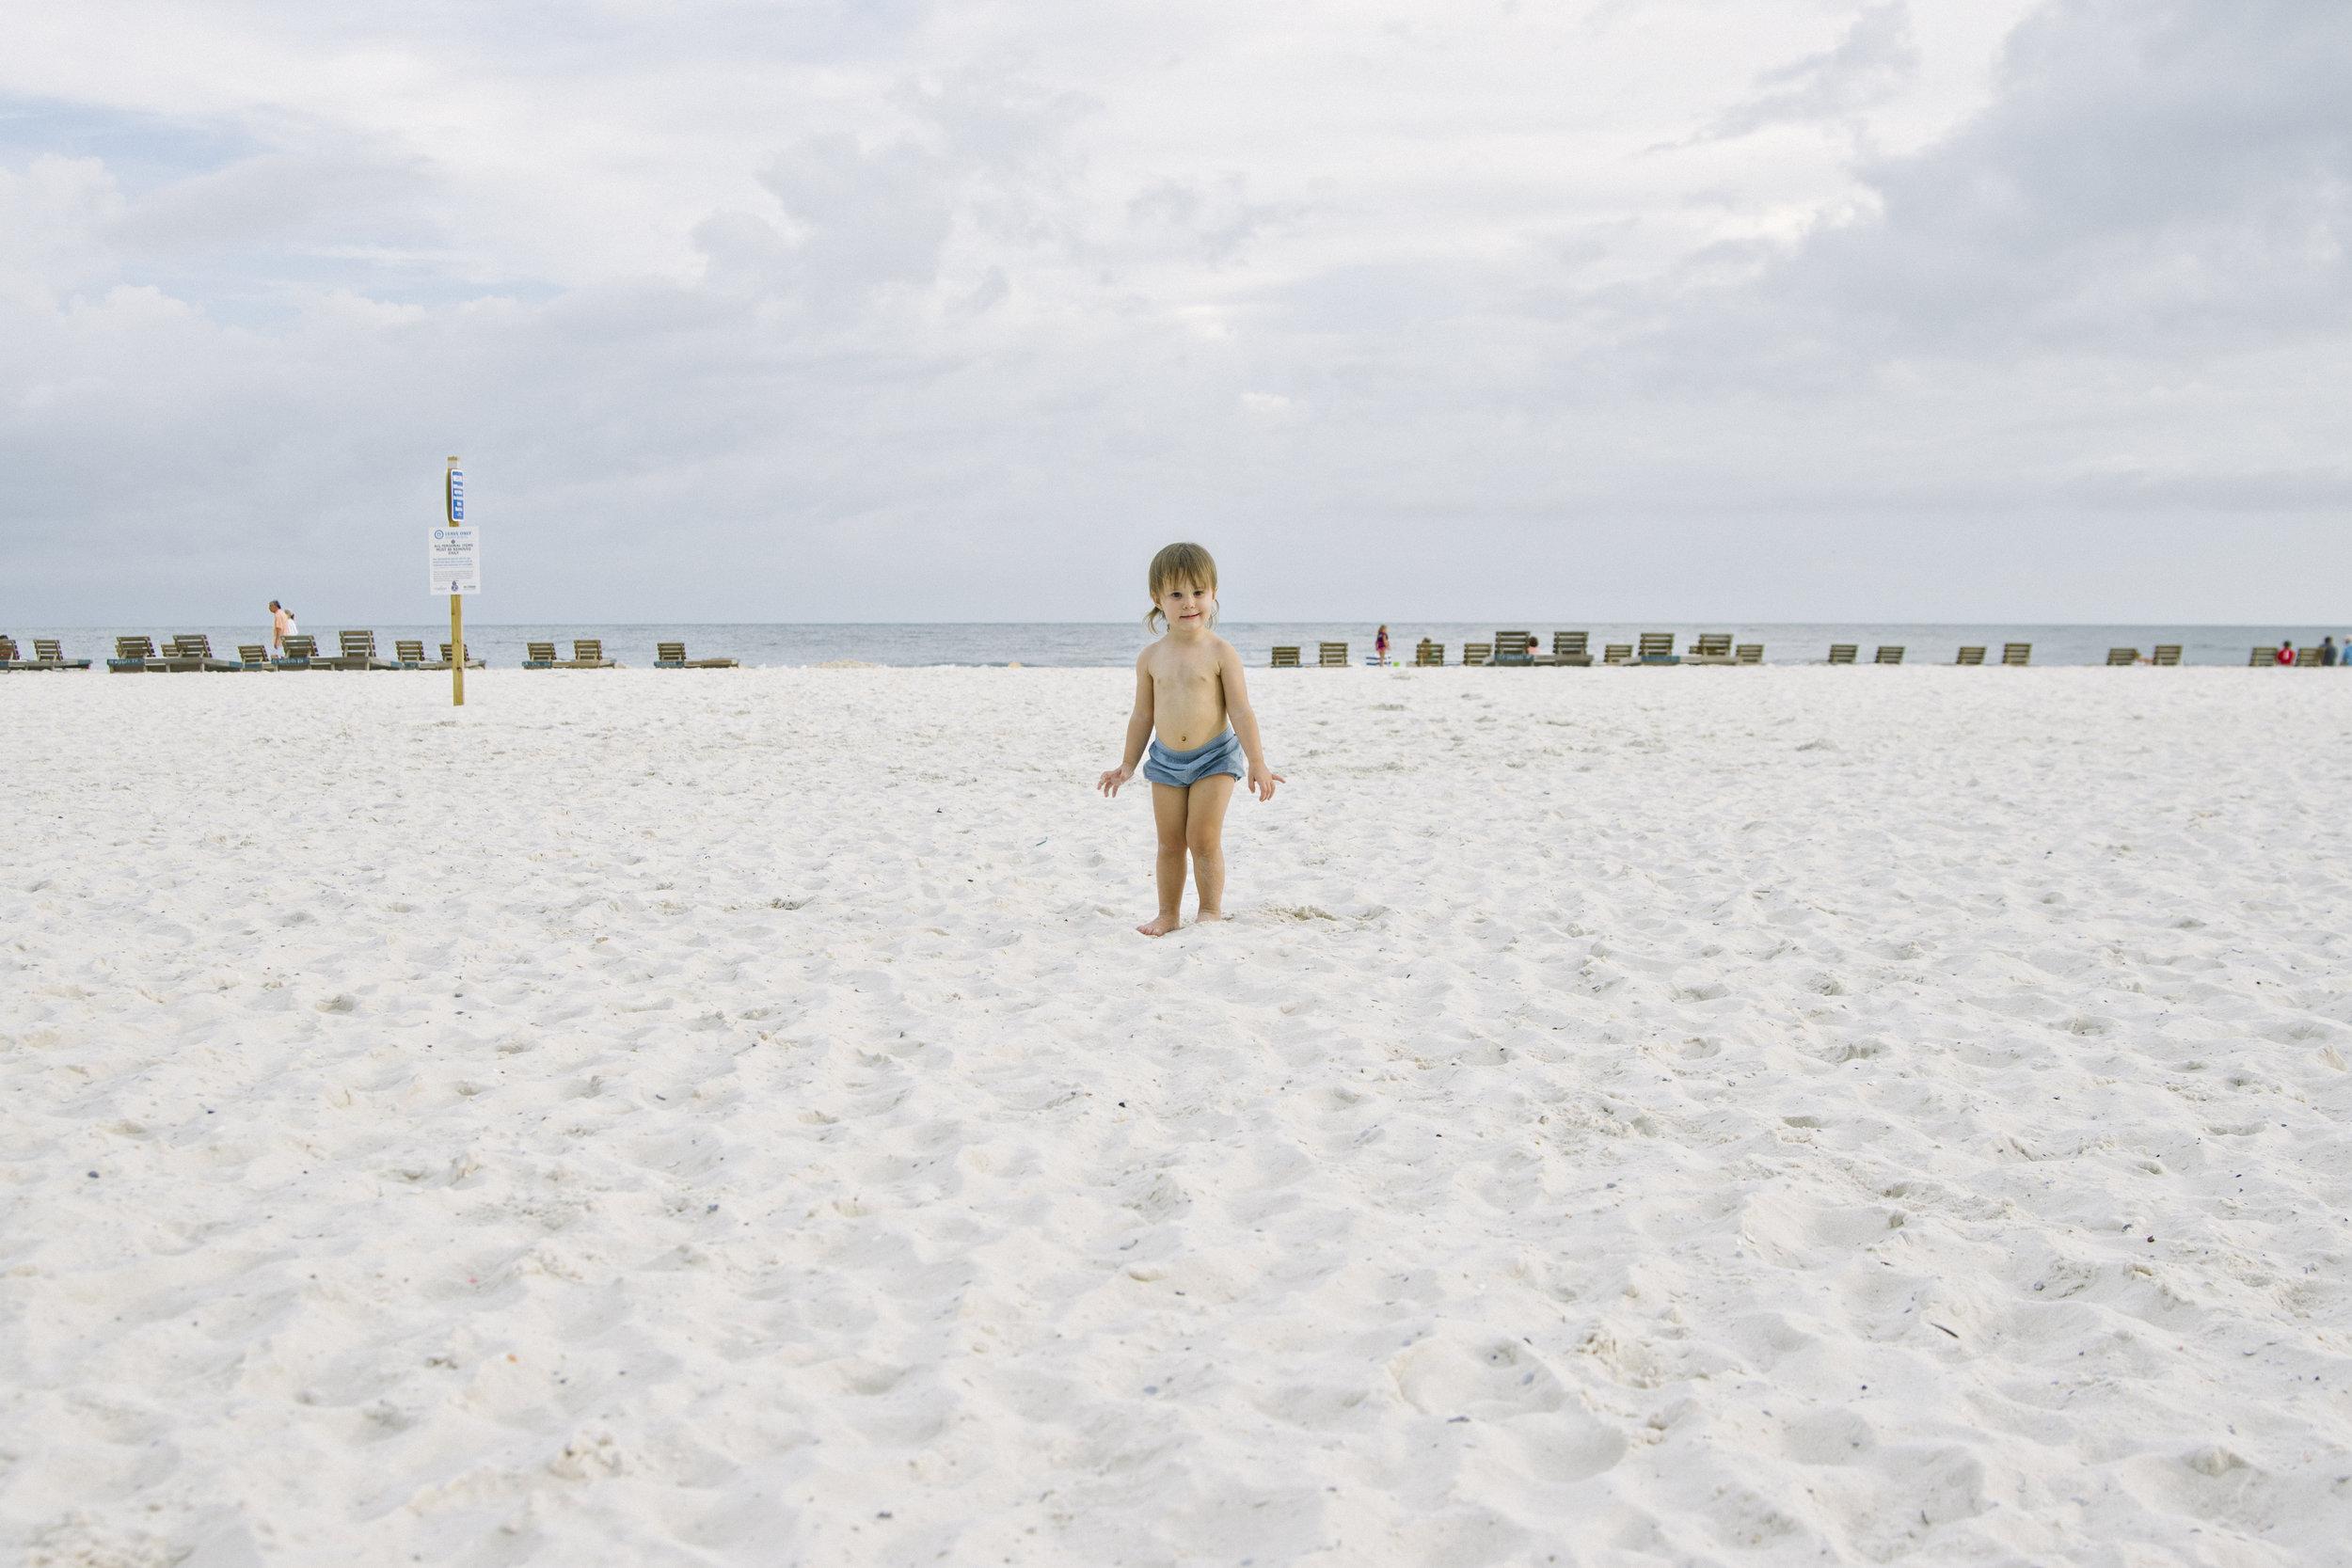 Beach_Trip_2016_024.jpg